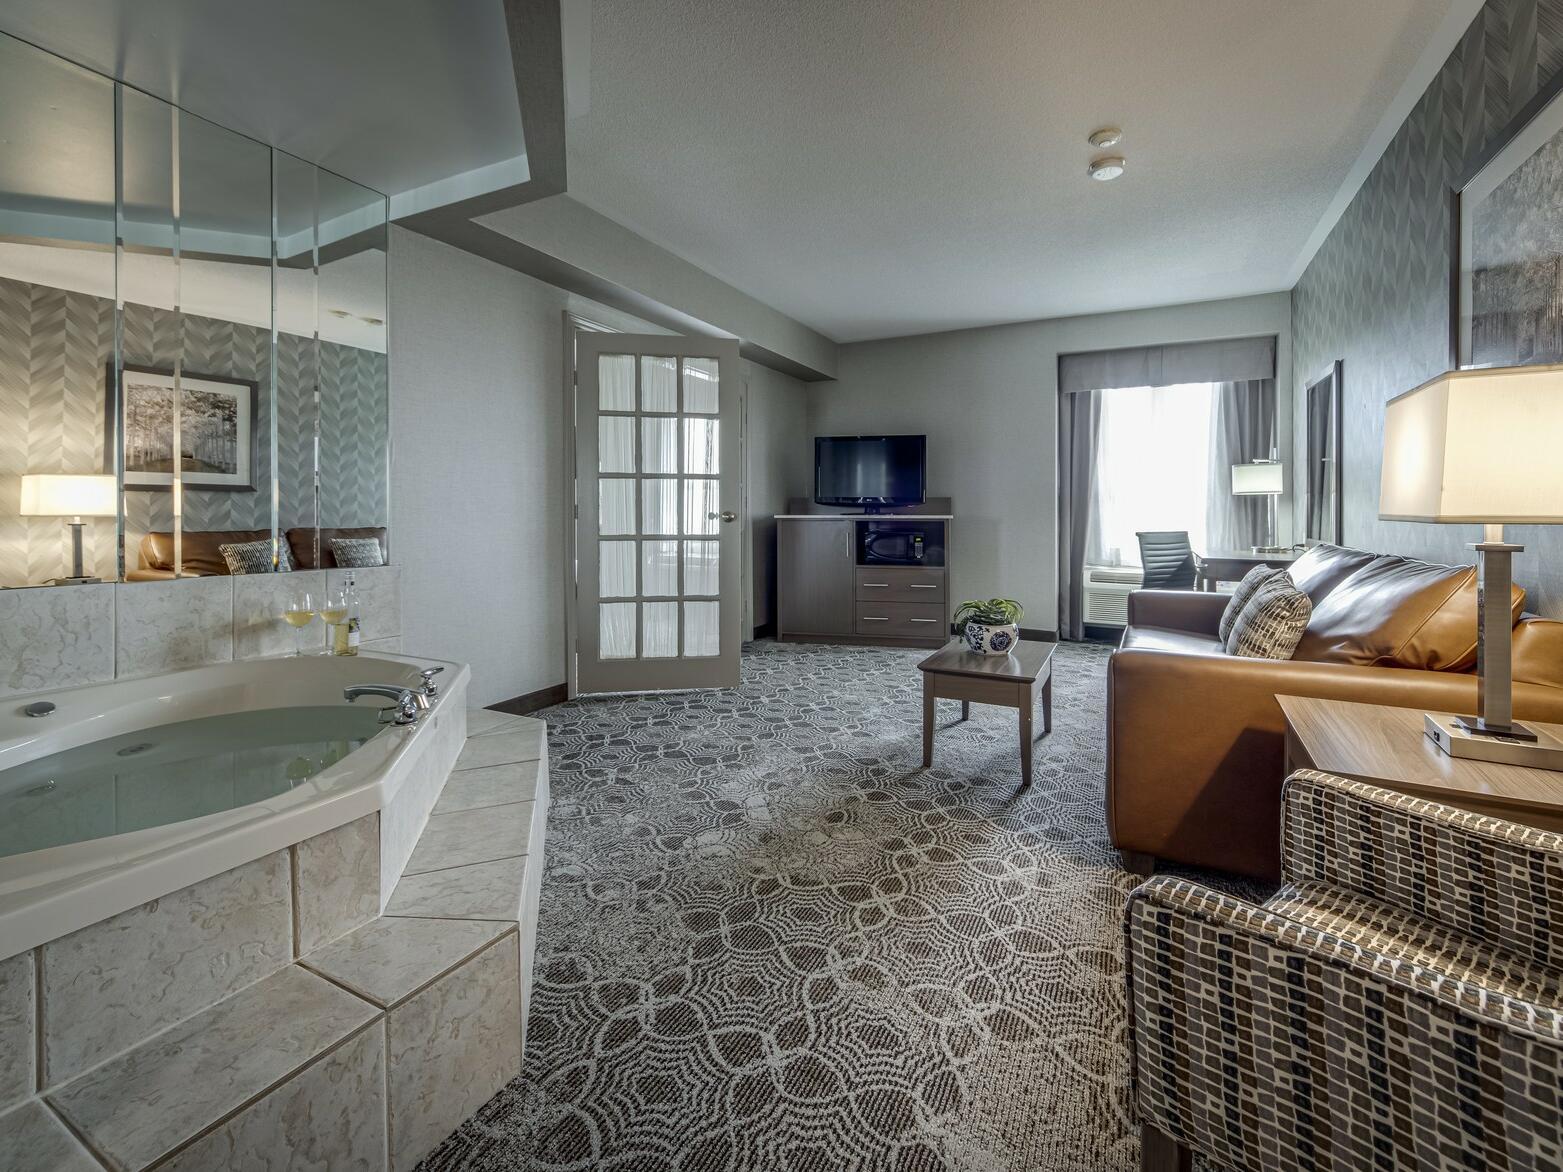 Deluxe  King Jacuzzi - Monte Carlo Inn Toronto Markham